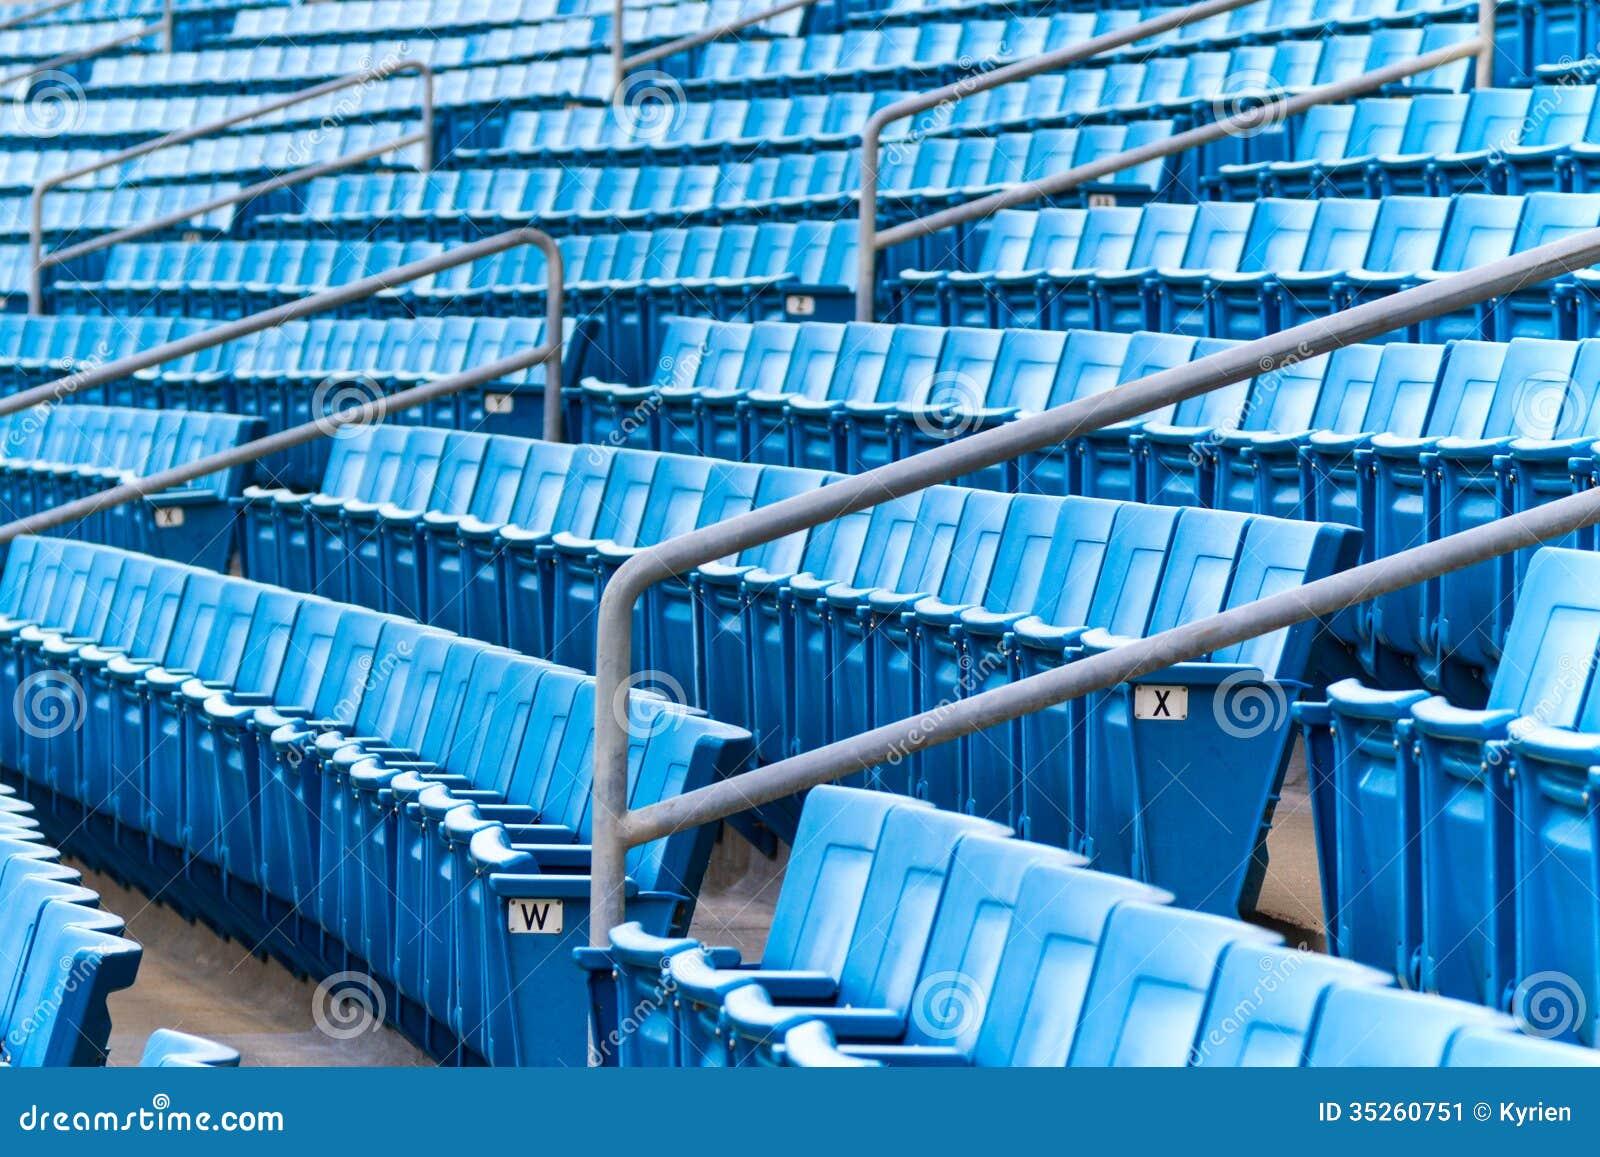 Stadium seating stock image Image of horizontal bench